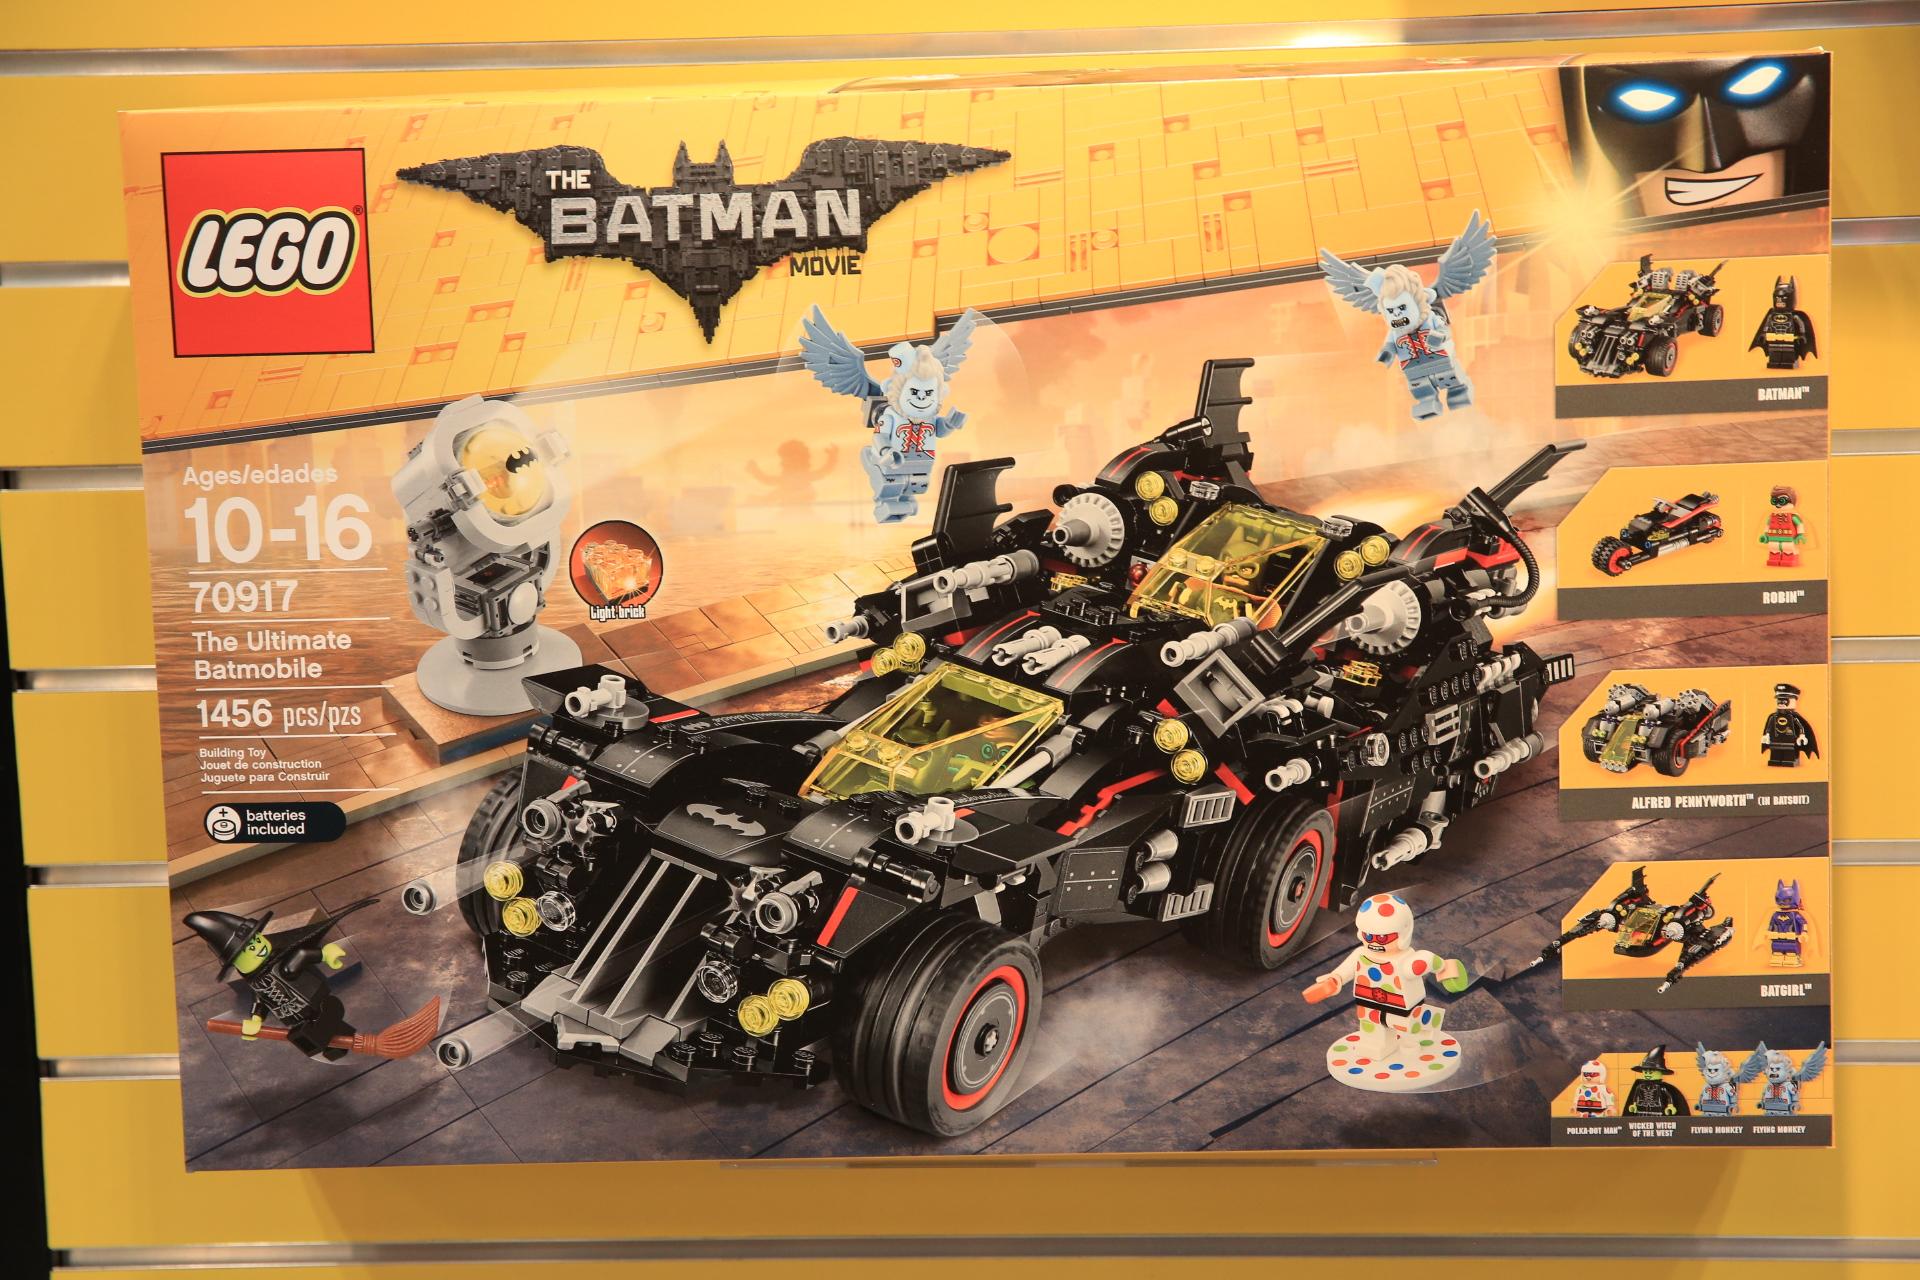 Lego New York Toy Fair Set Images The Brick Fan